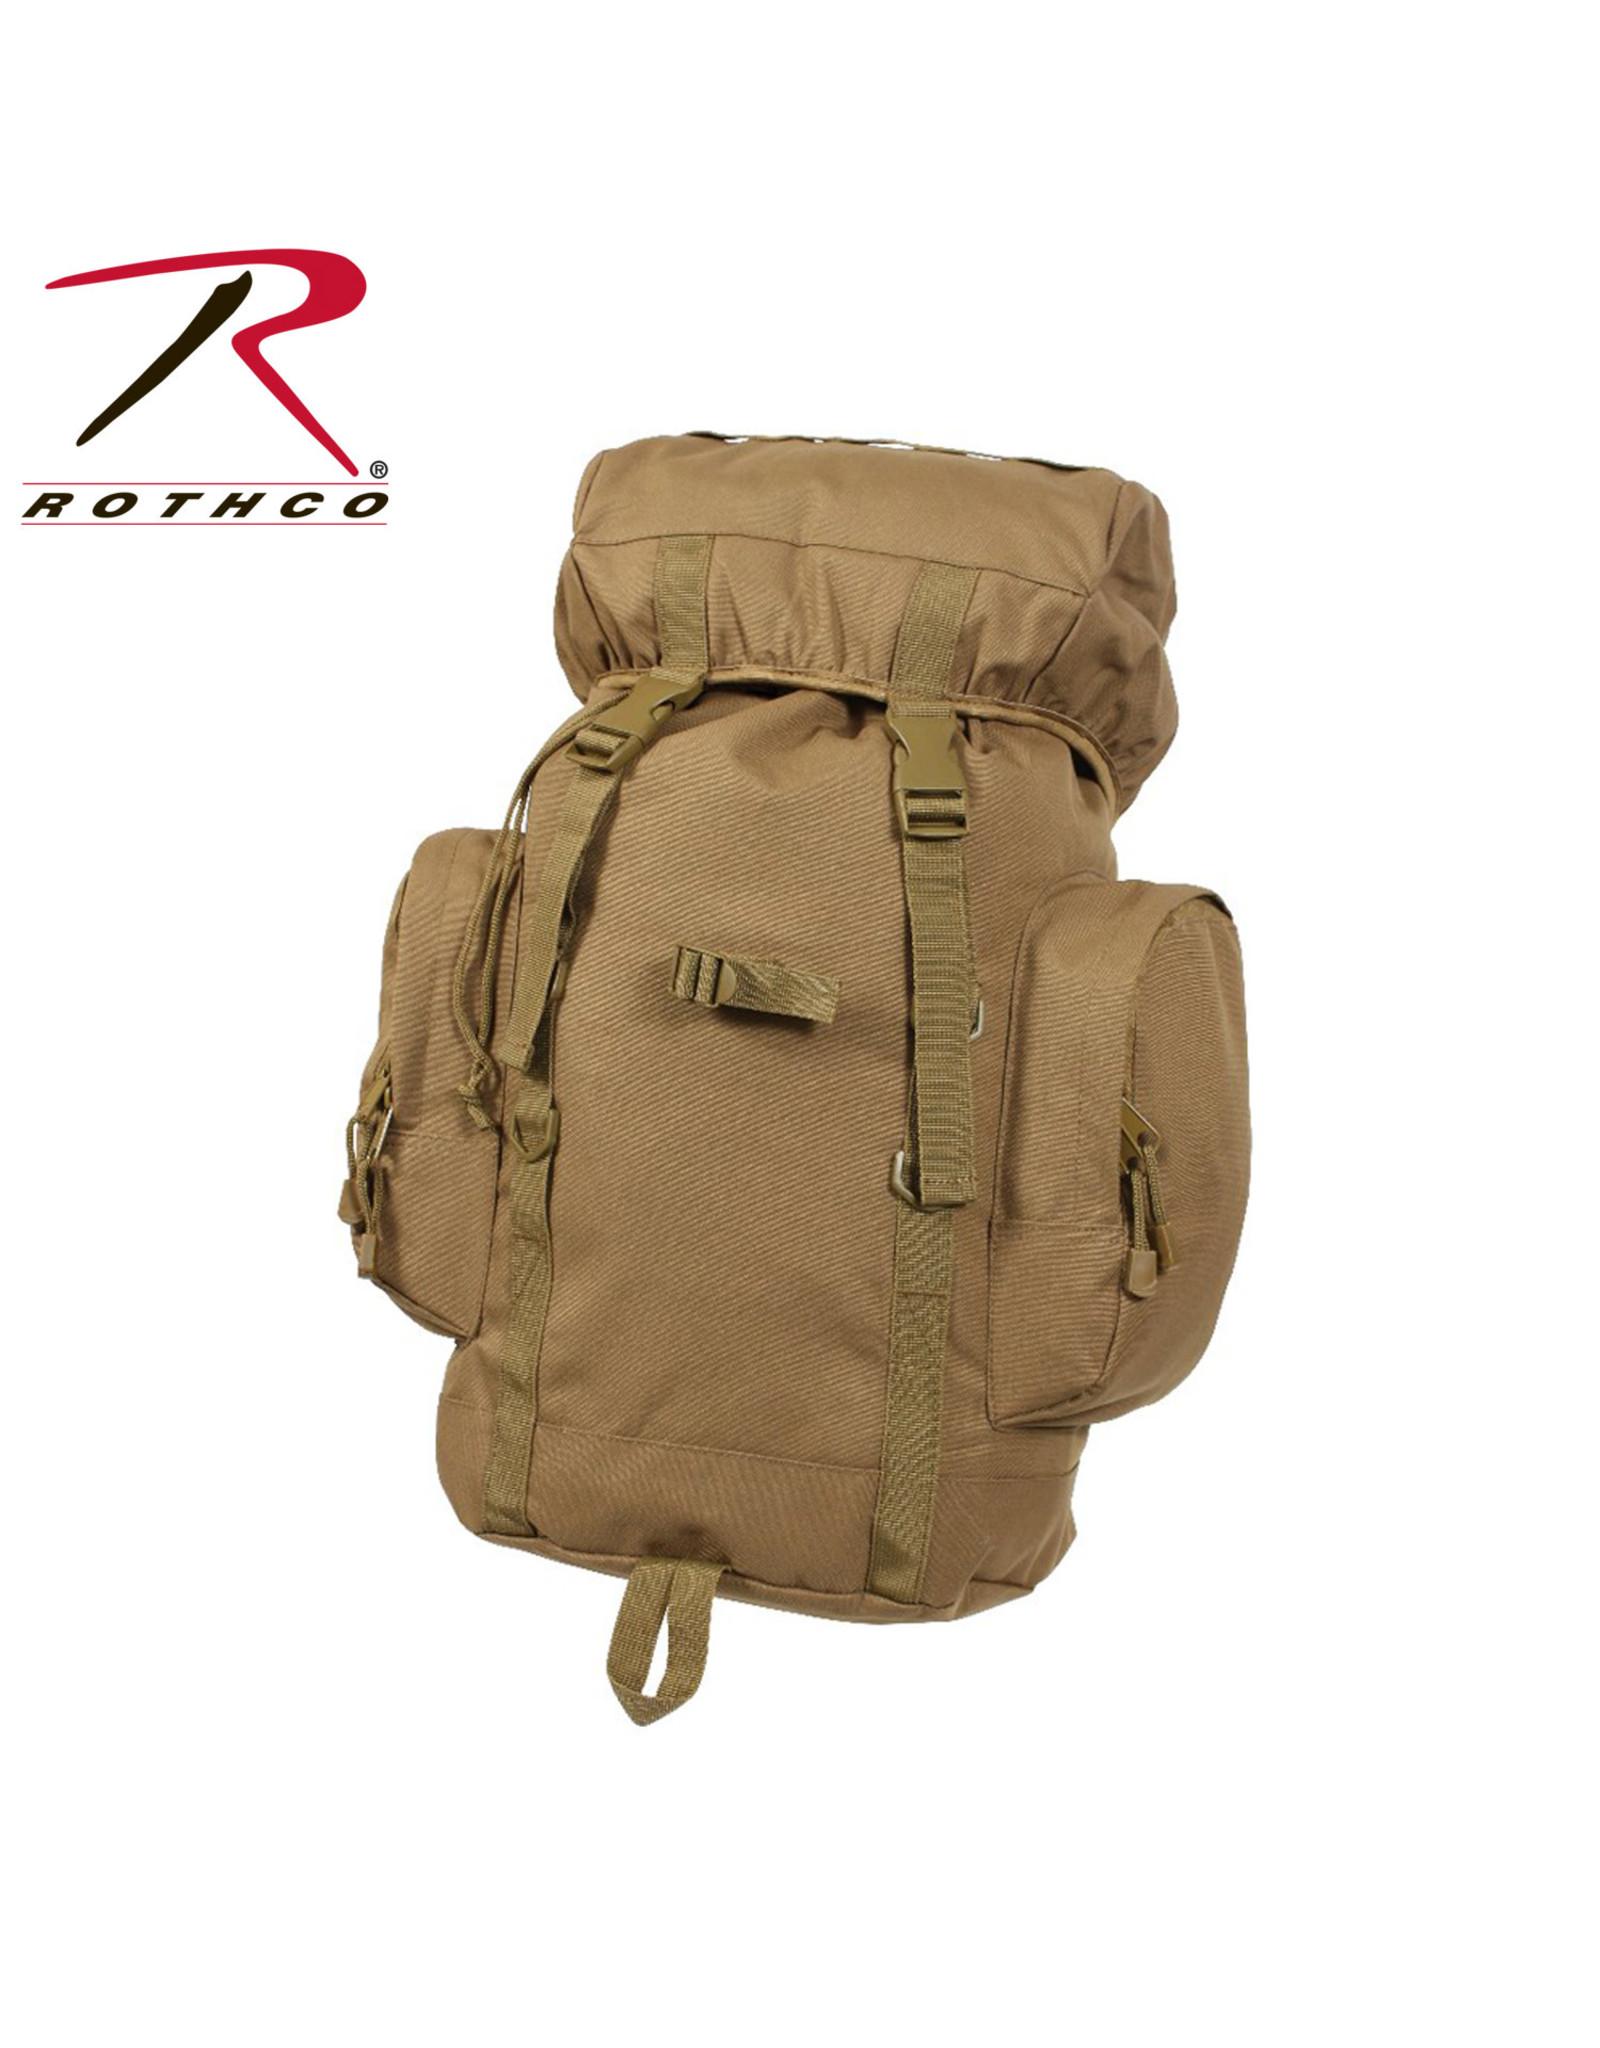 Rothco 25 Liter Backpack